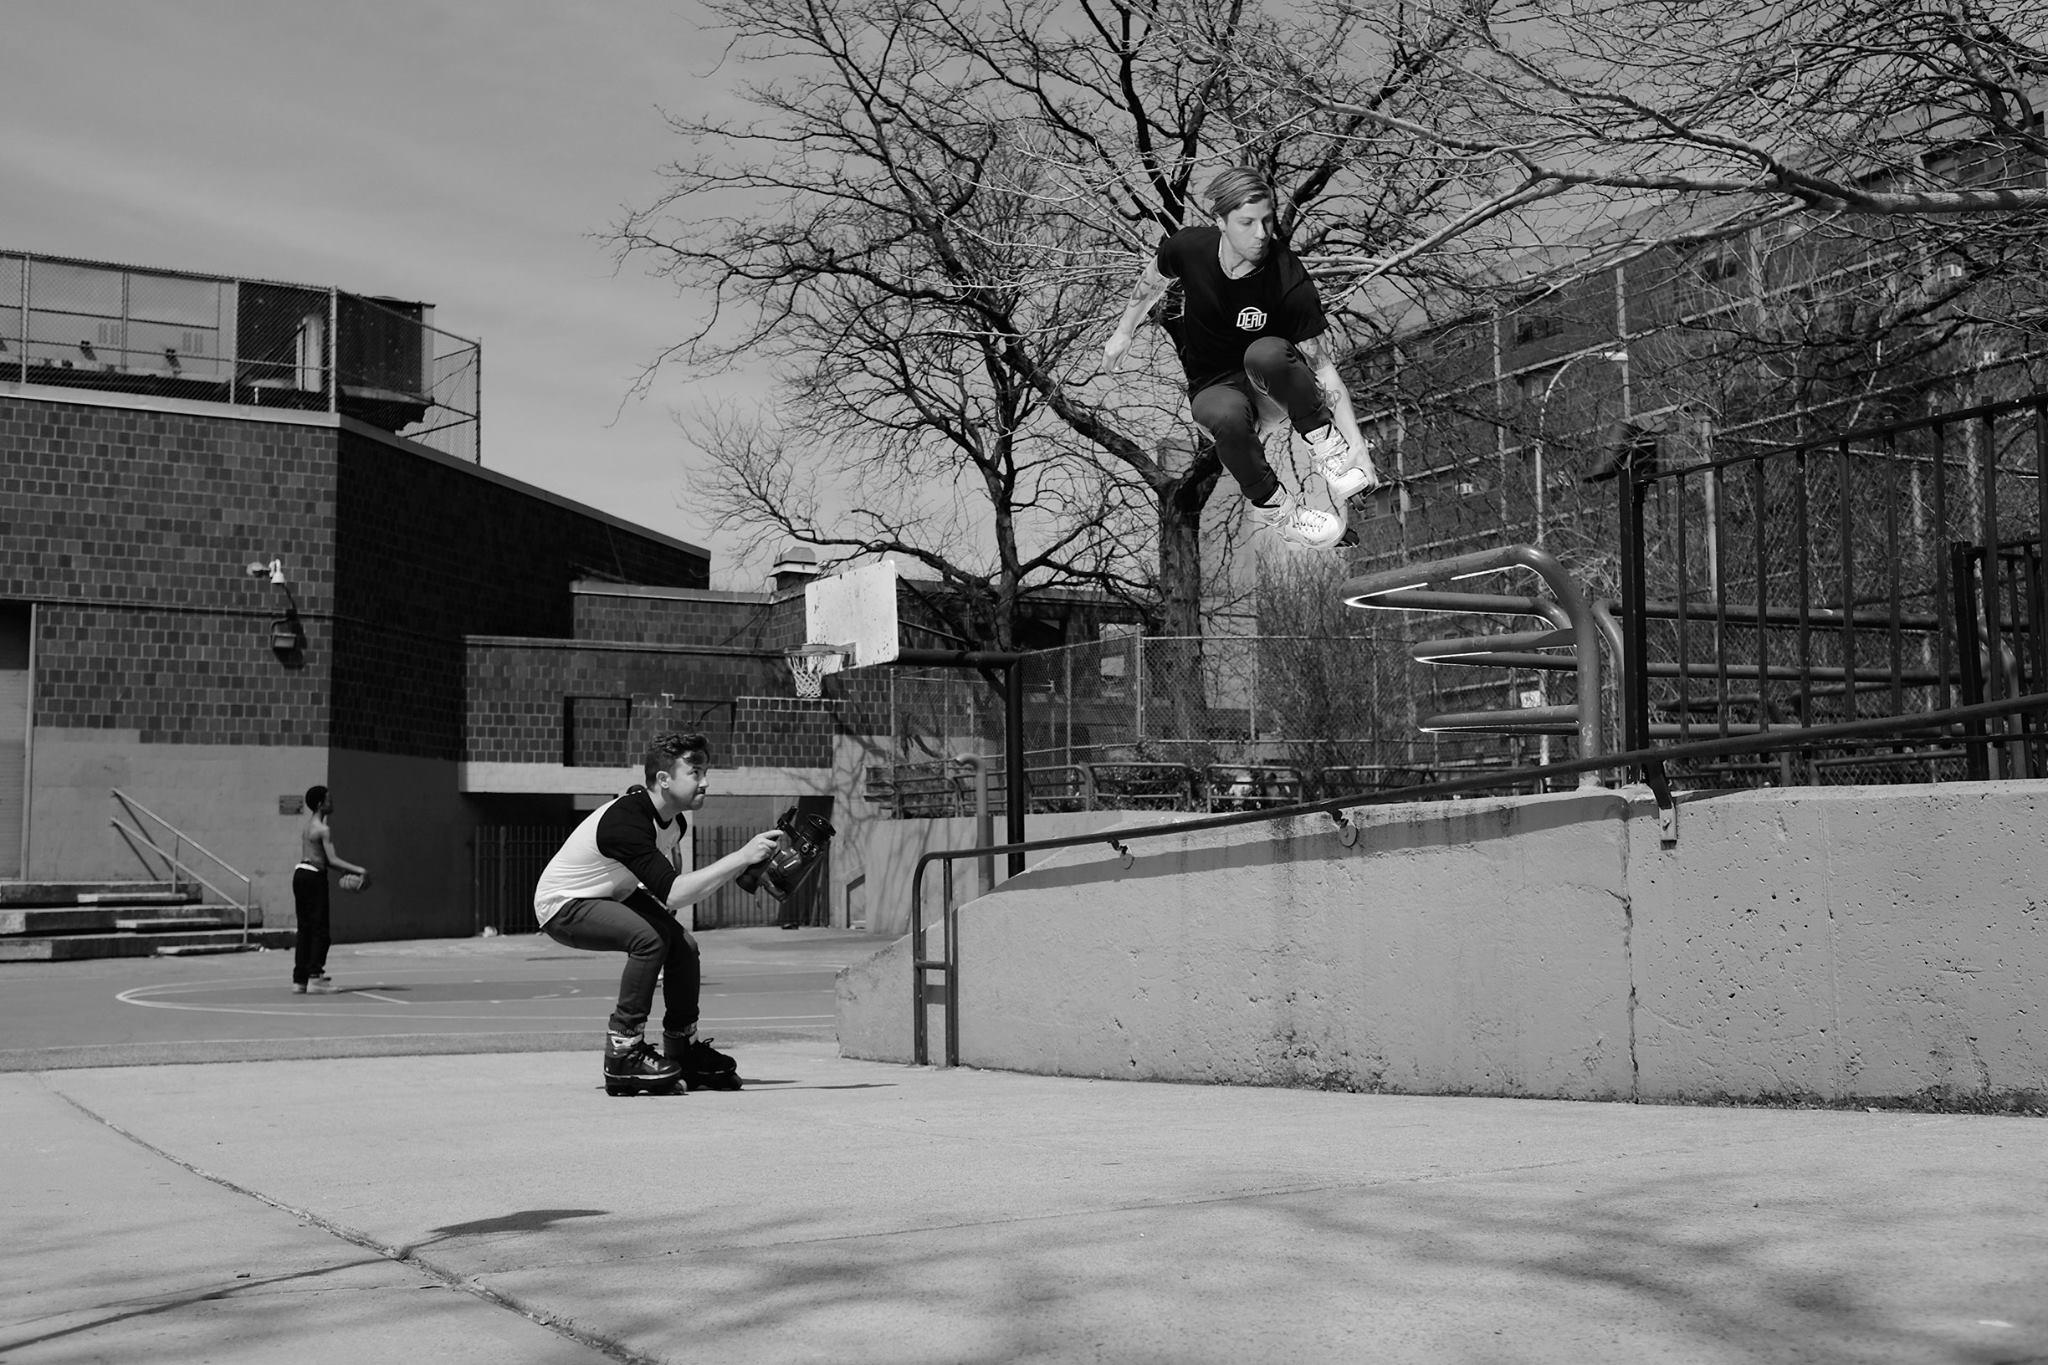 Adam Johnson filming Alex Broskow - photo by Shawn Engler